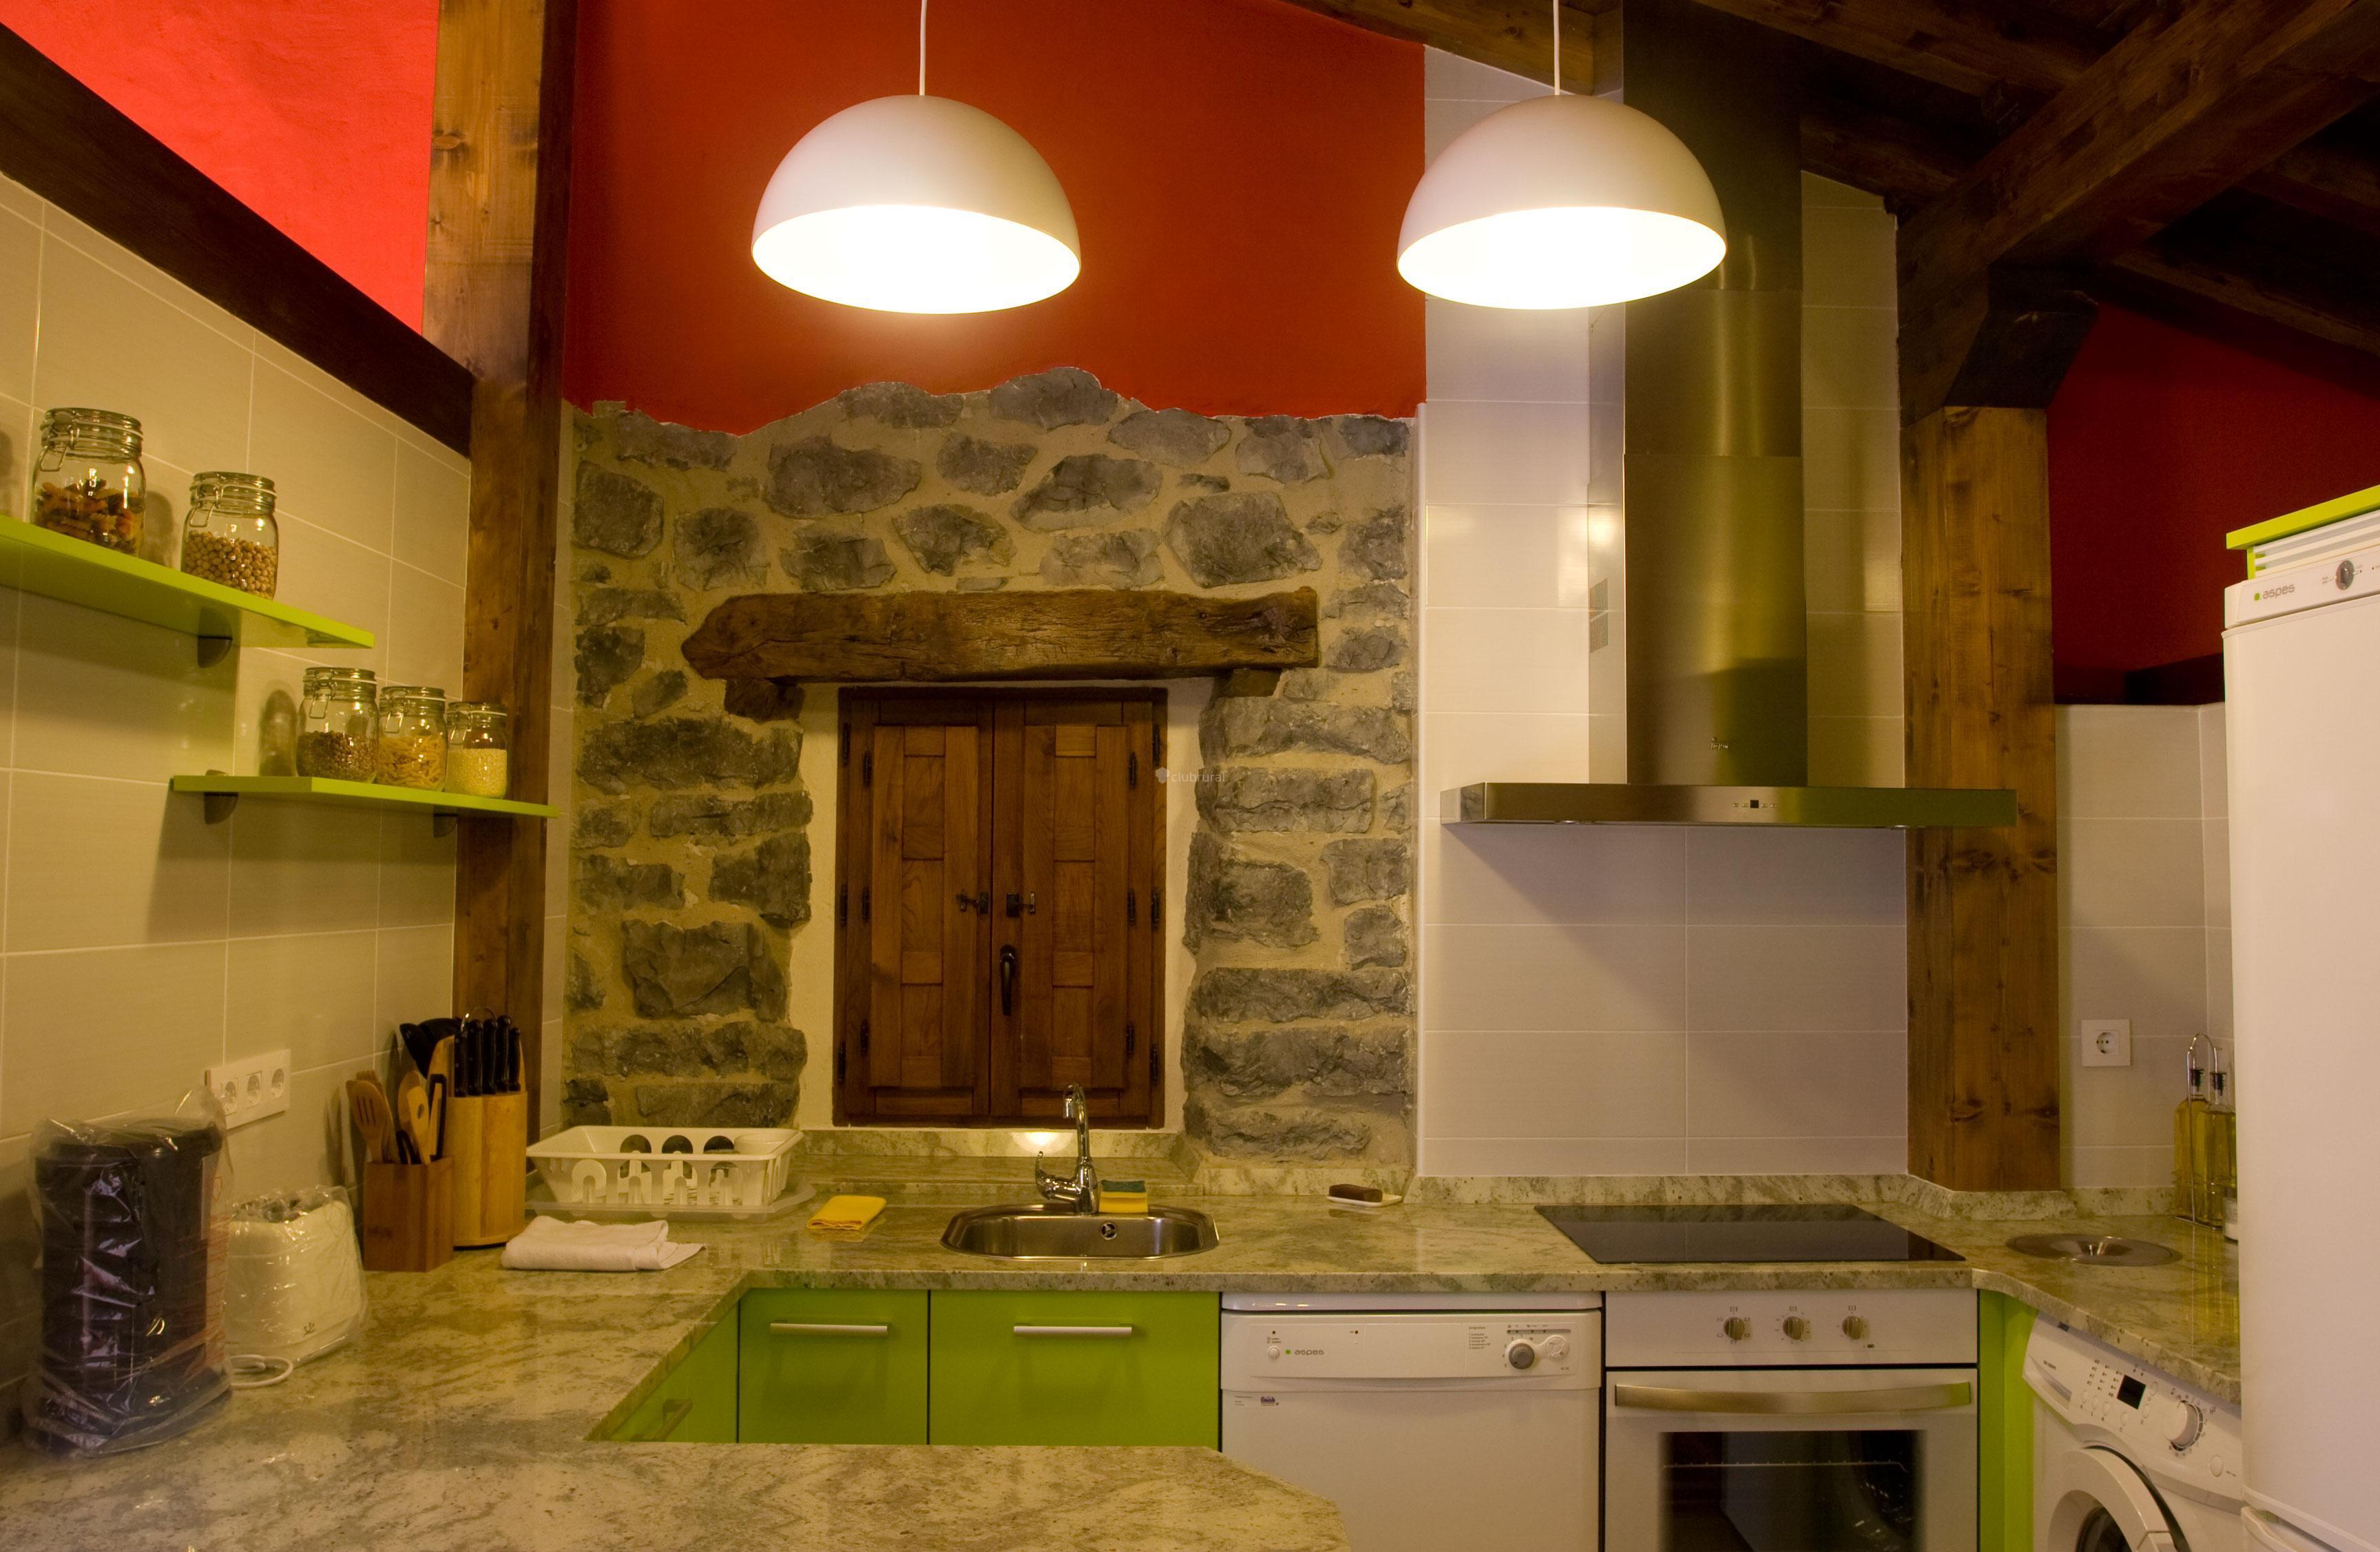 Increíble Isla De Cocina Cascada Molde - Como Decorar la Cocina ...